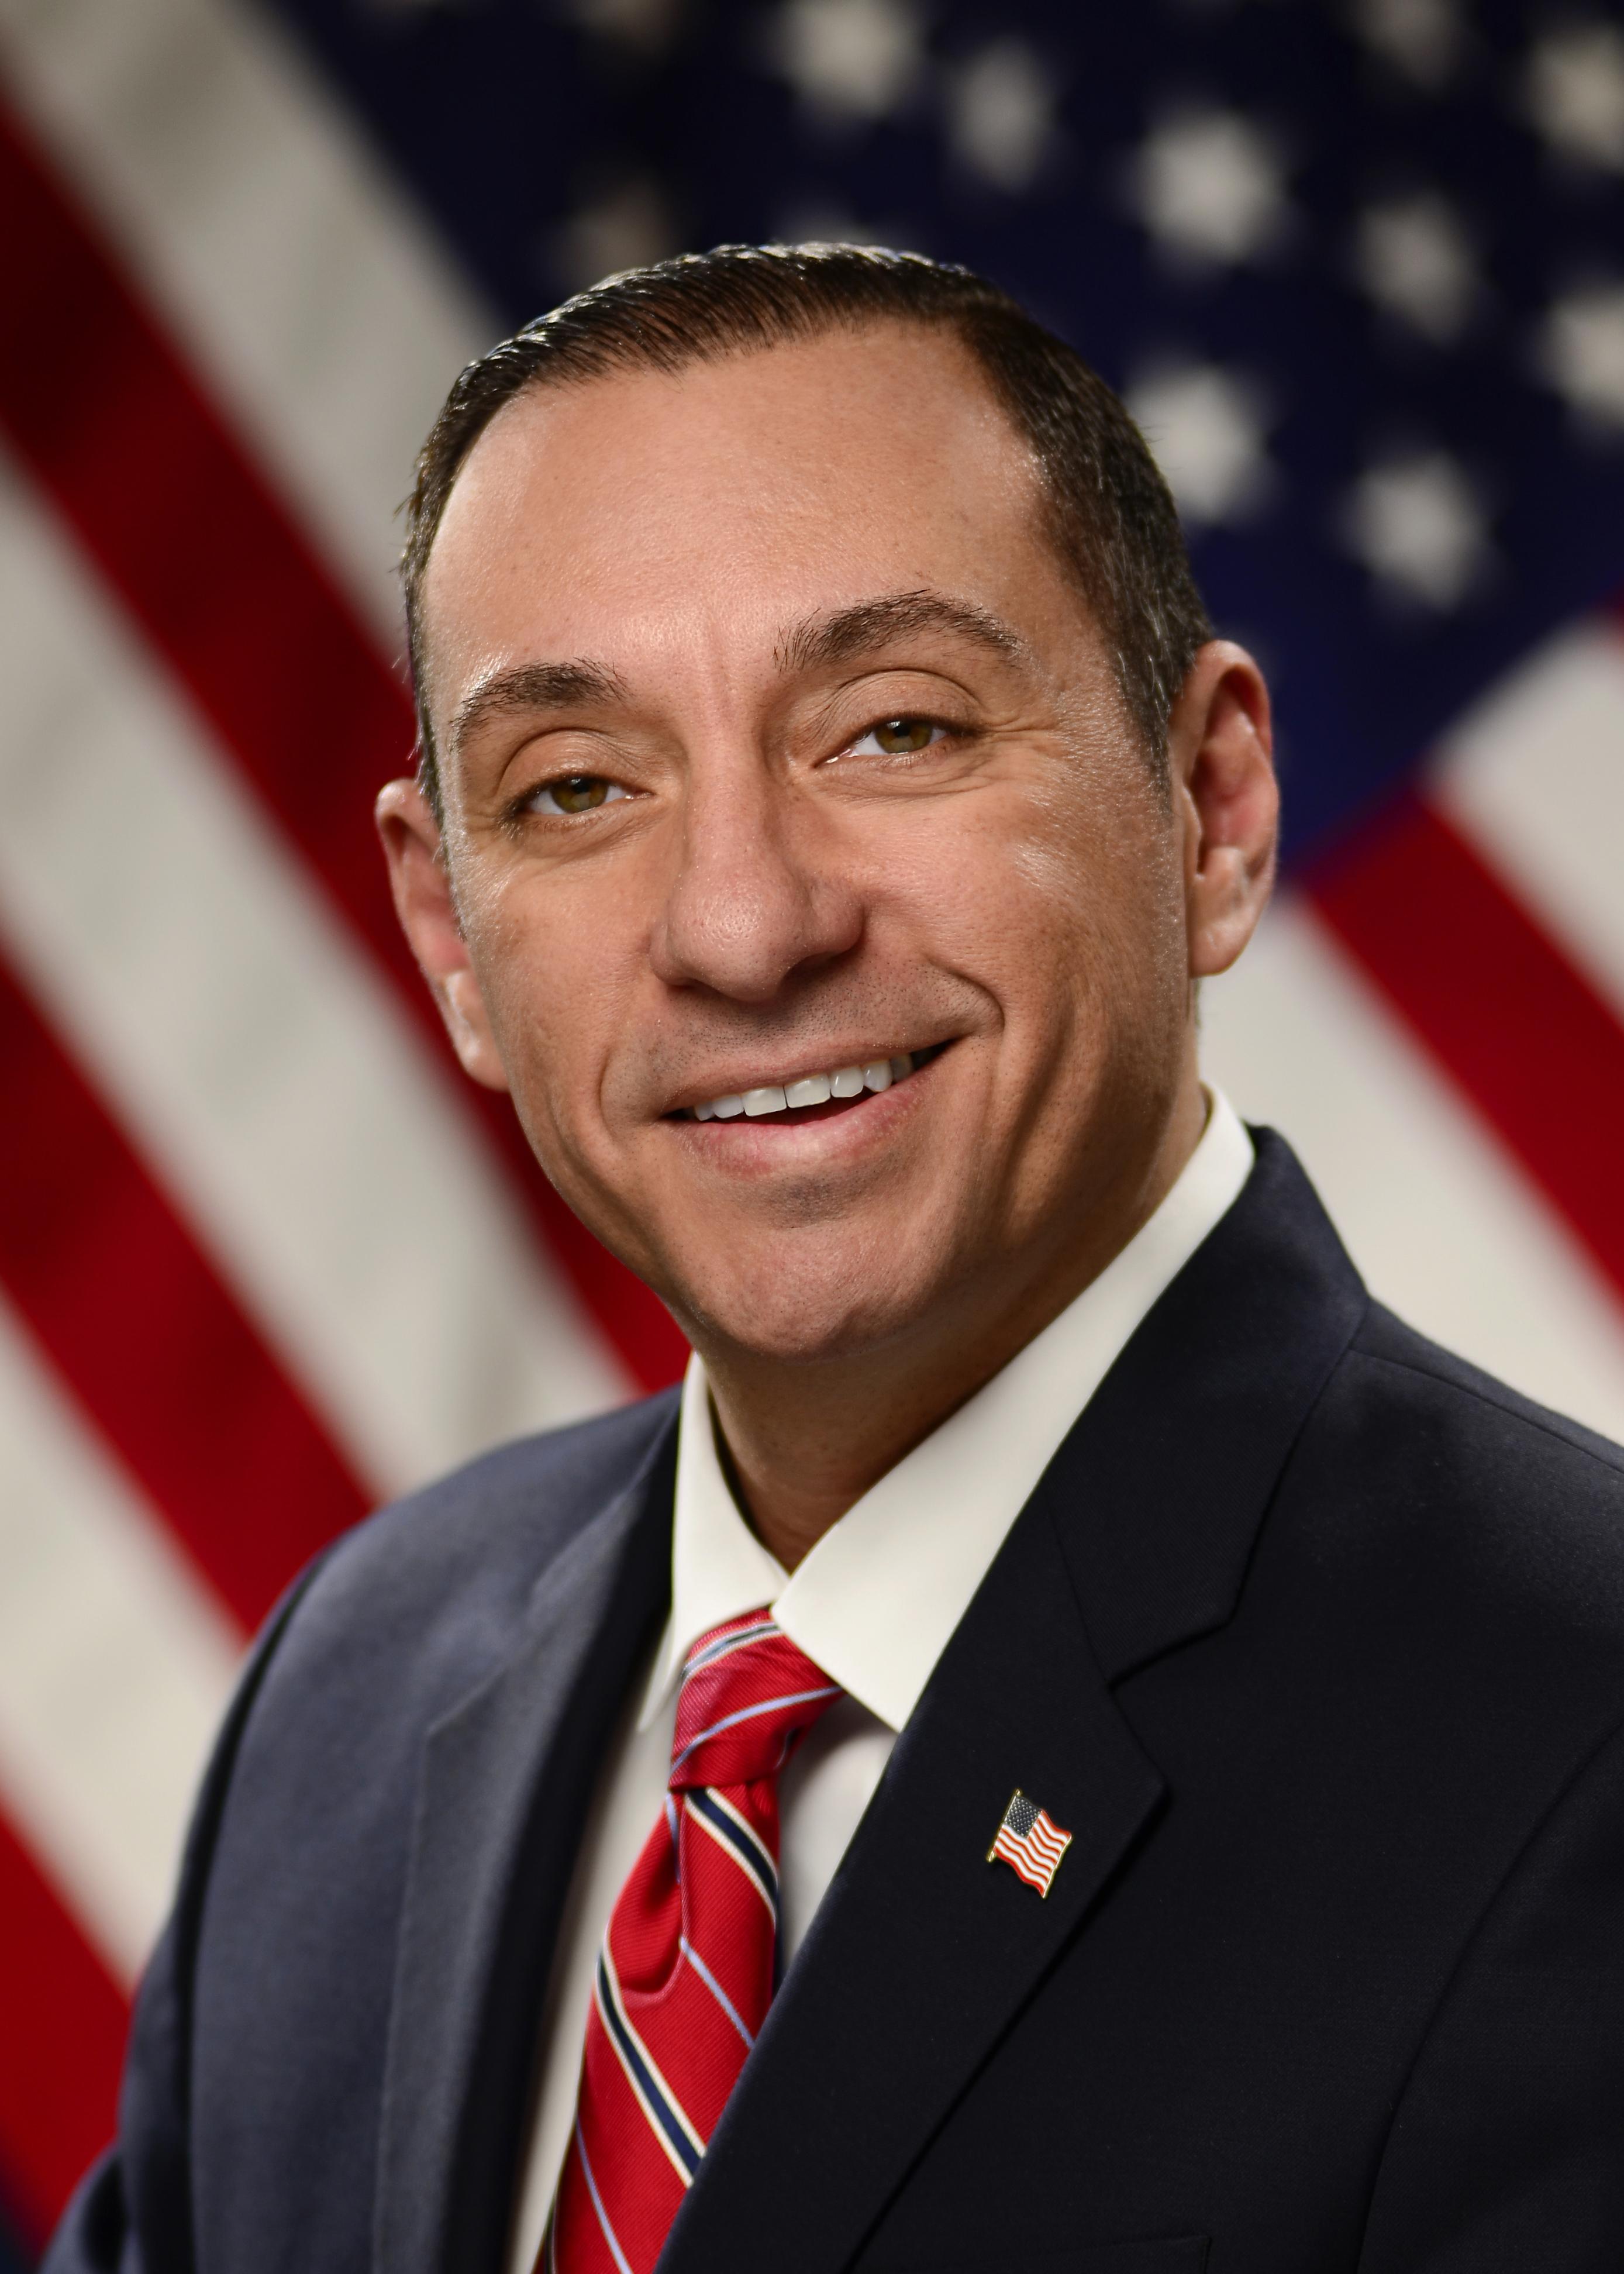 Joseph Lopez is challenging Venizia for mayor in Bloomfield.